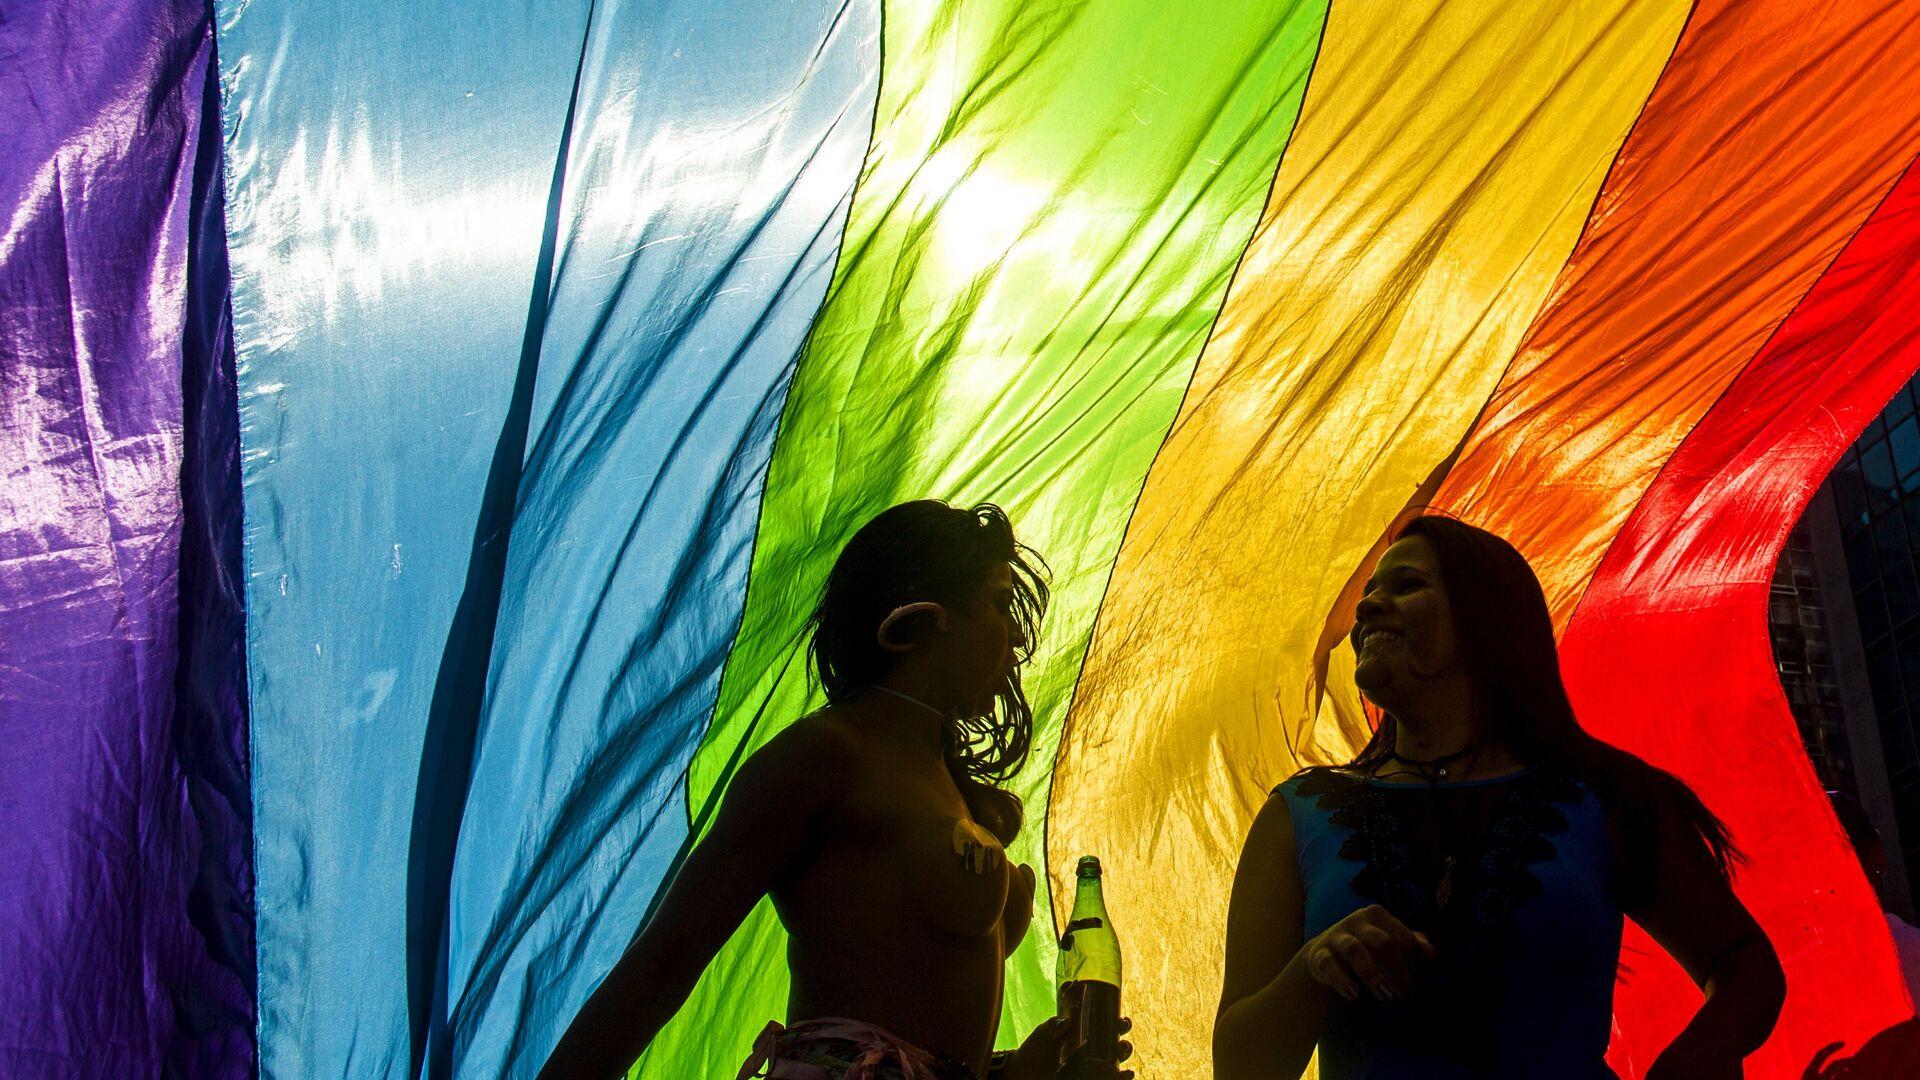 Revellers take part in the 19th Gay Pride parade along Paulista Avenue in Sao Paulo, Brazil, June 7, 2015 - Sputnik Mundo, 1920, 29.06.2021